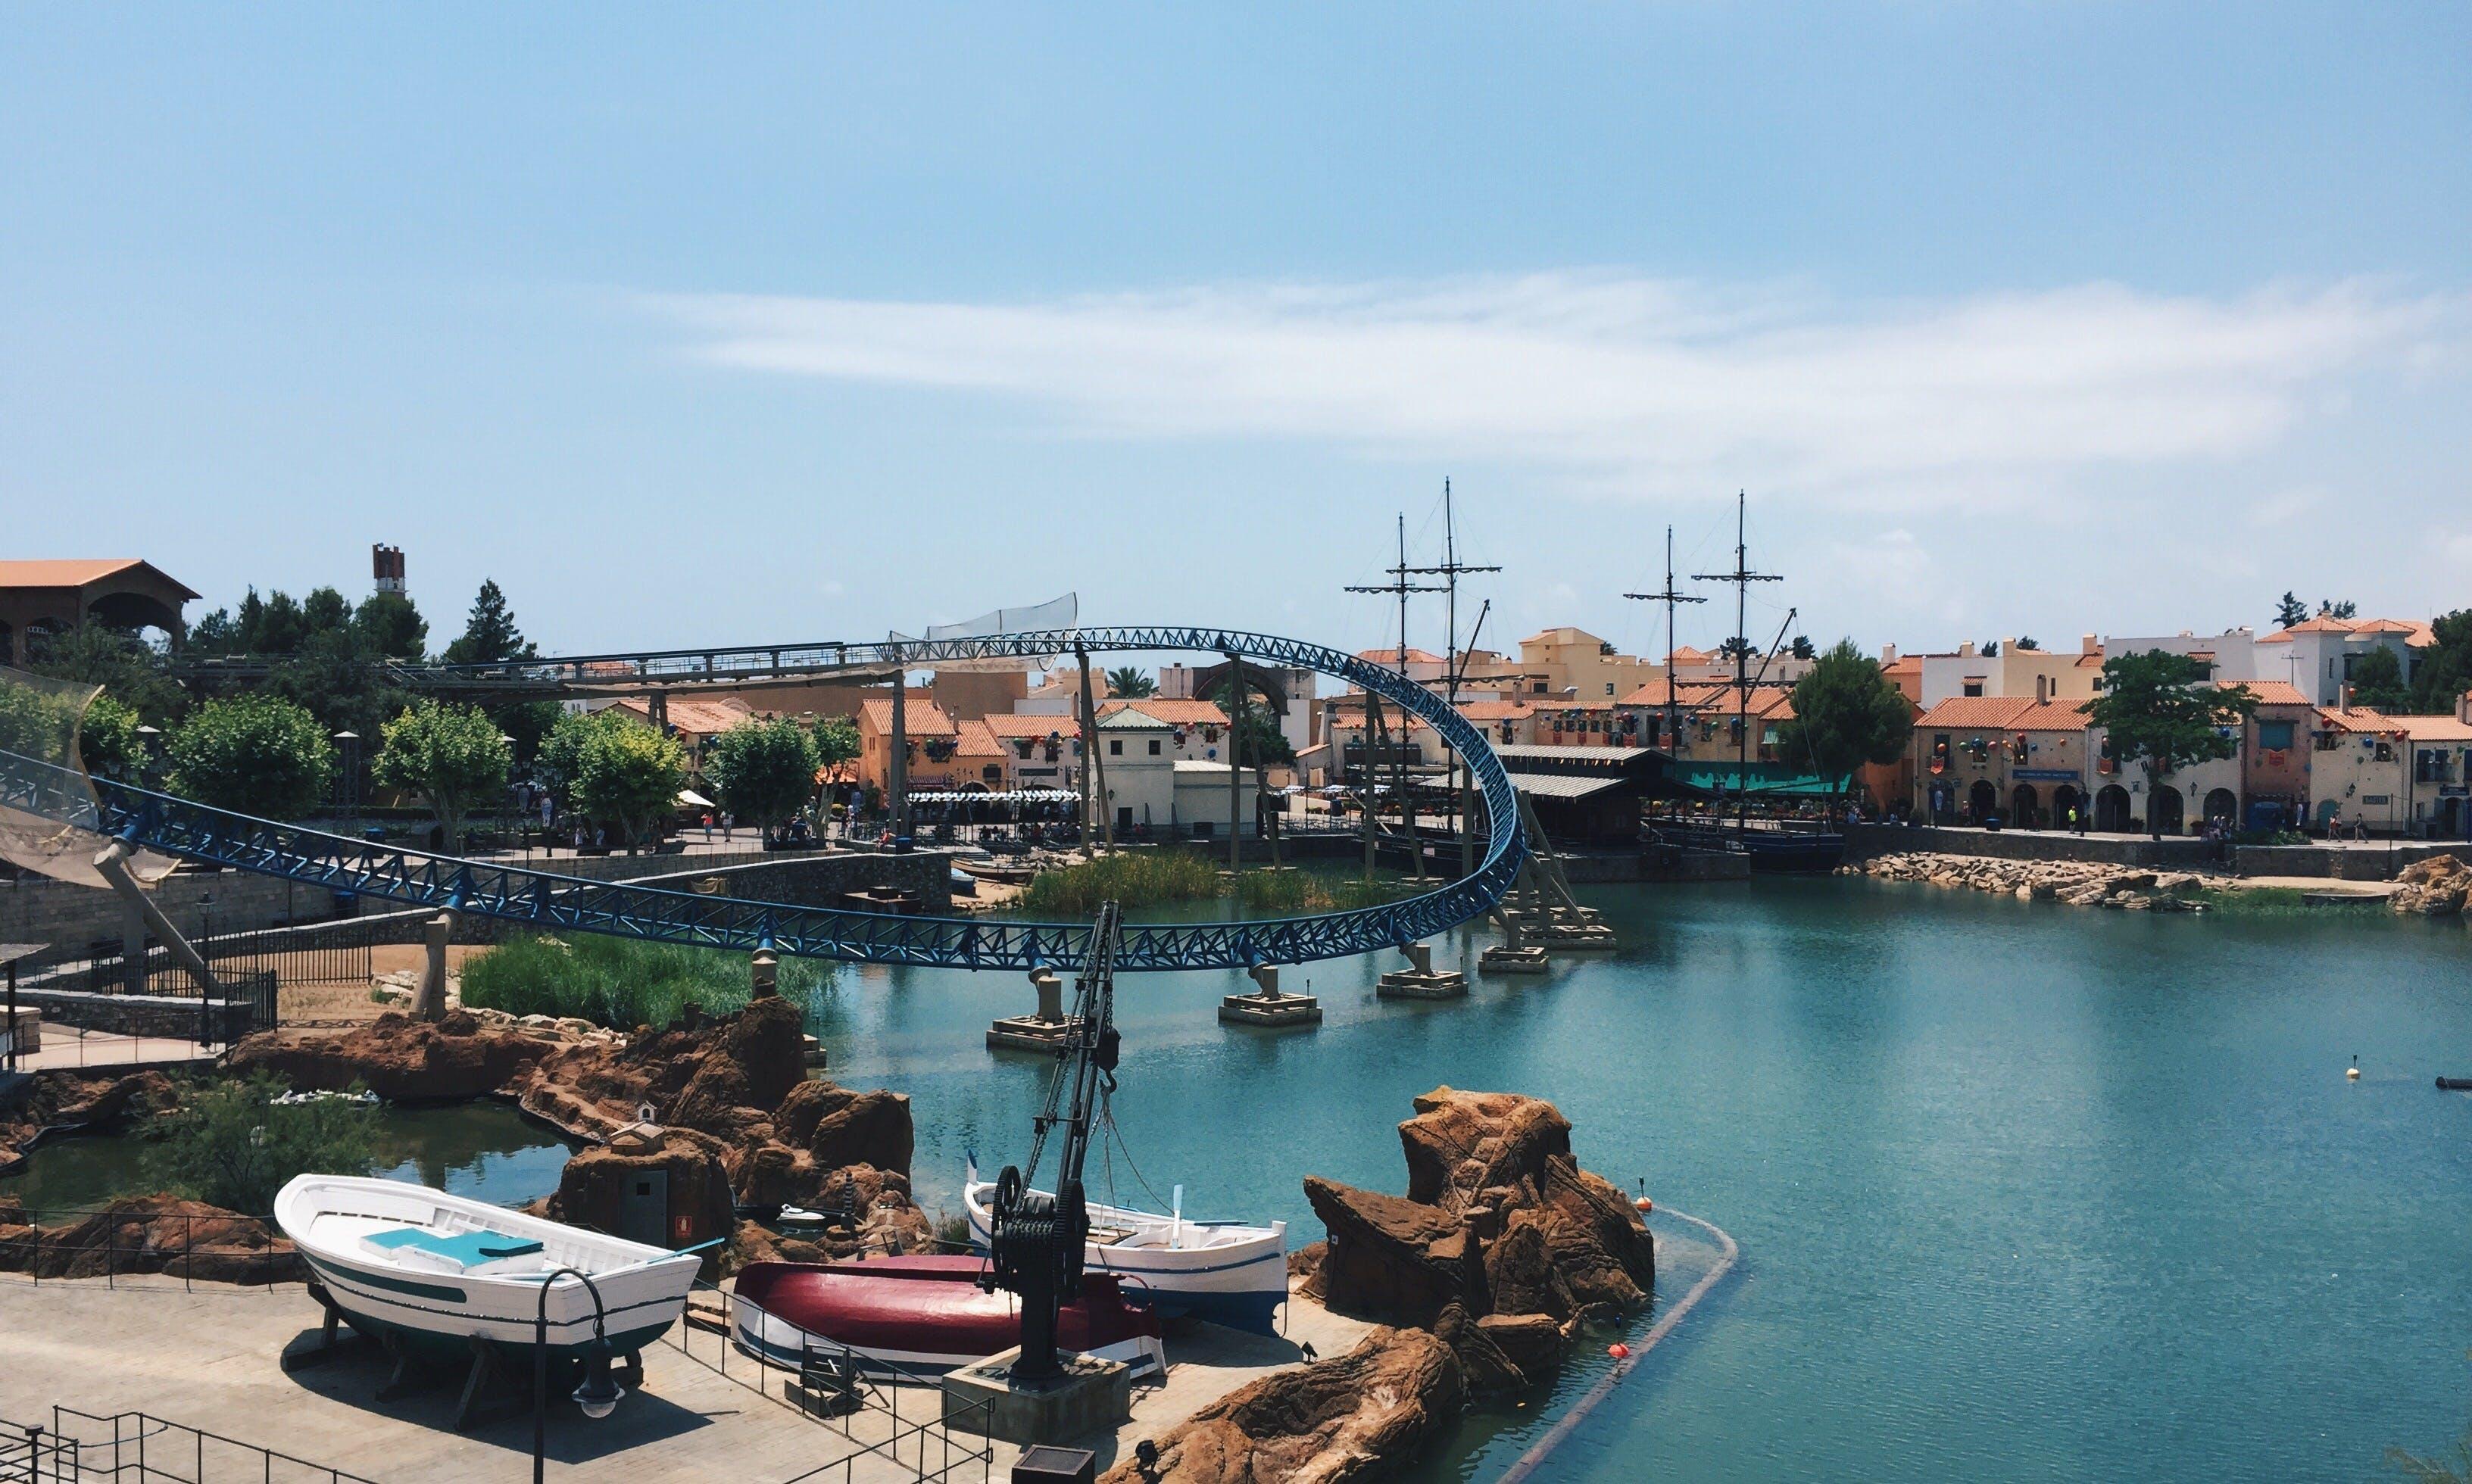 Kostenloses Stock Foto zu abenteuer, pool, port aventura, abenteuer park